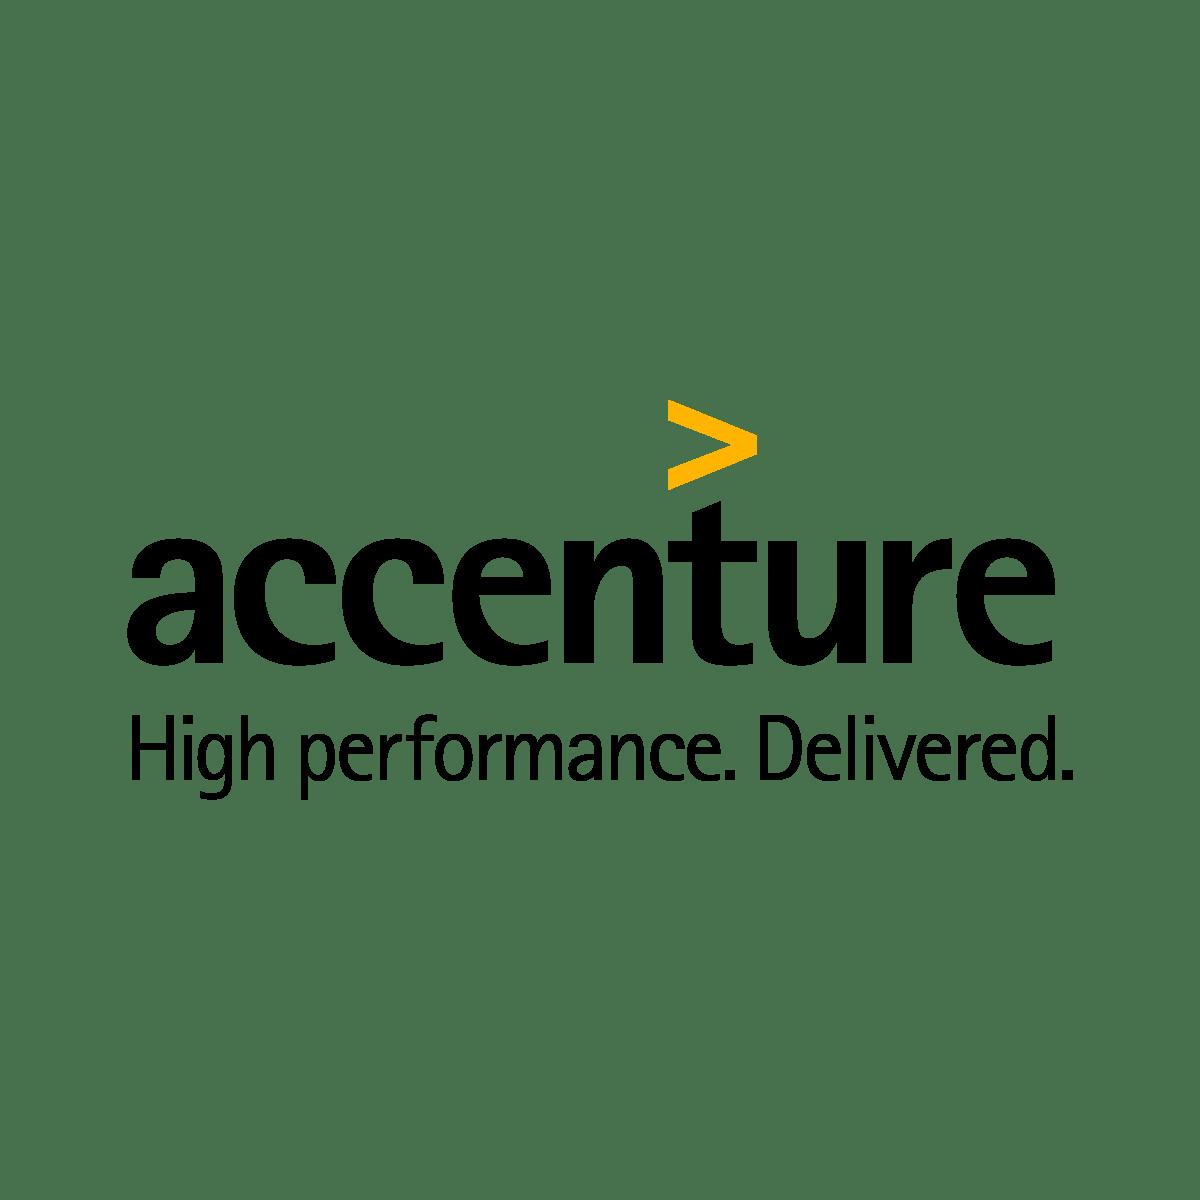 Accenture Stock Analysis (ACN)